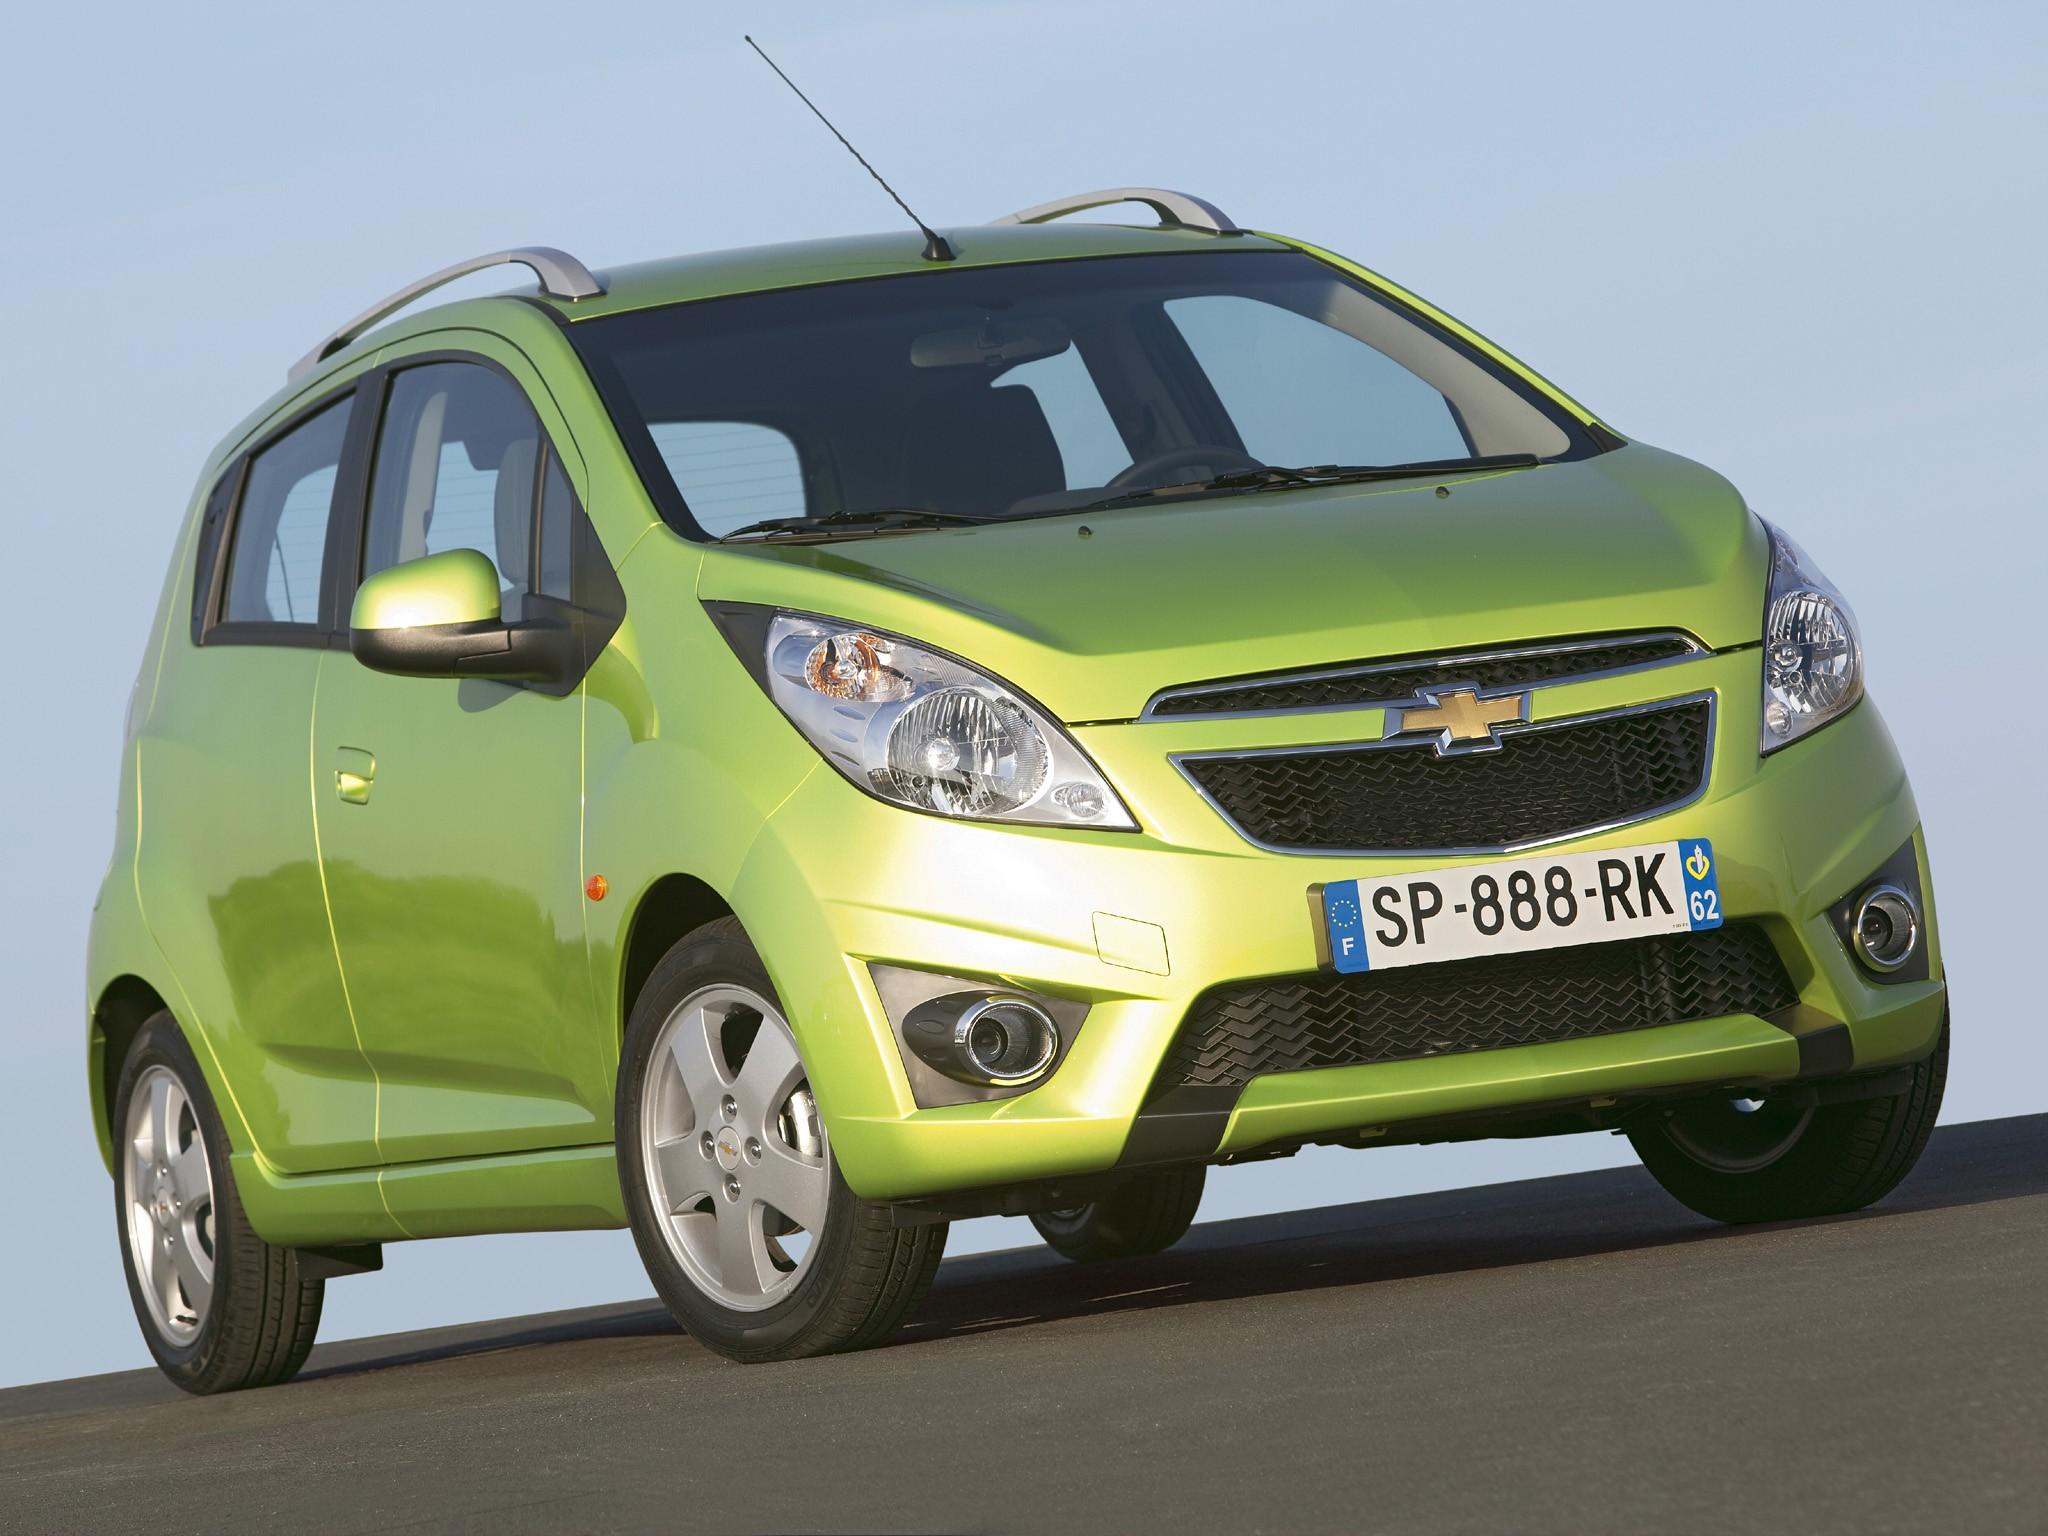 Chevrolet matiz spark m300 specs 2009 2010 2011 2012 2013 2014 2015 2016